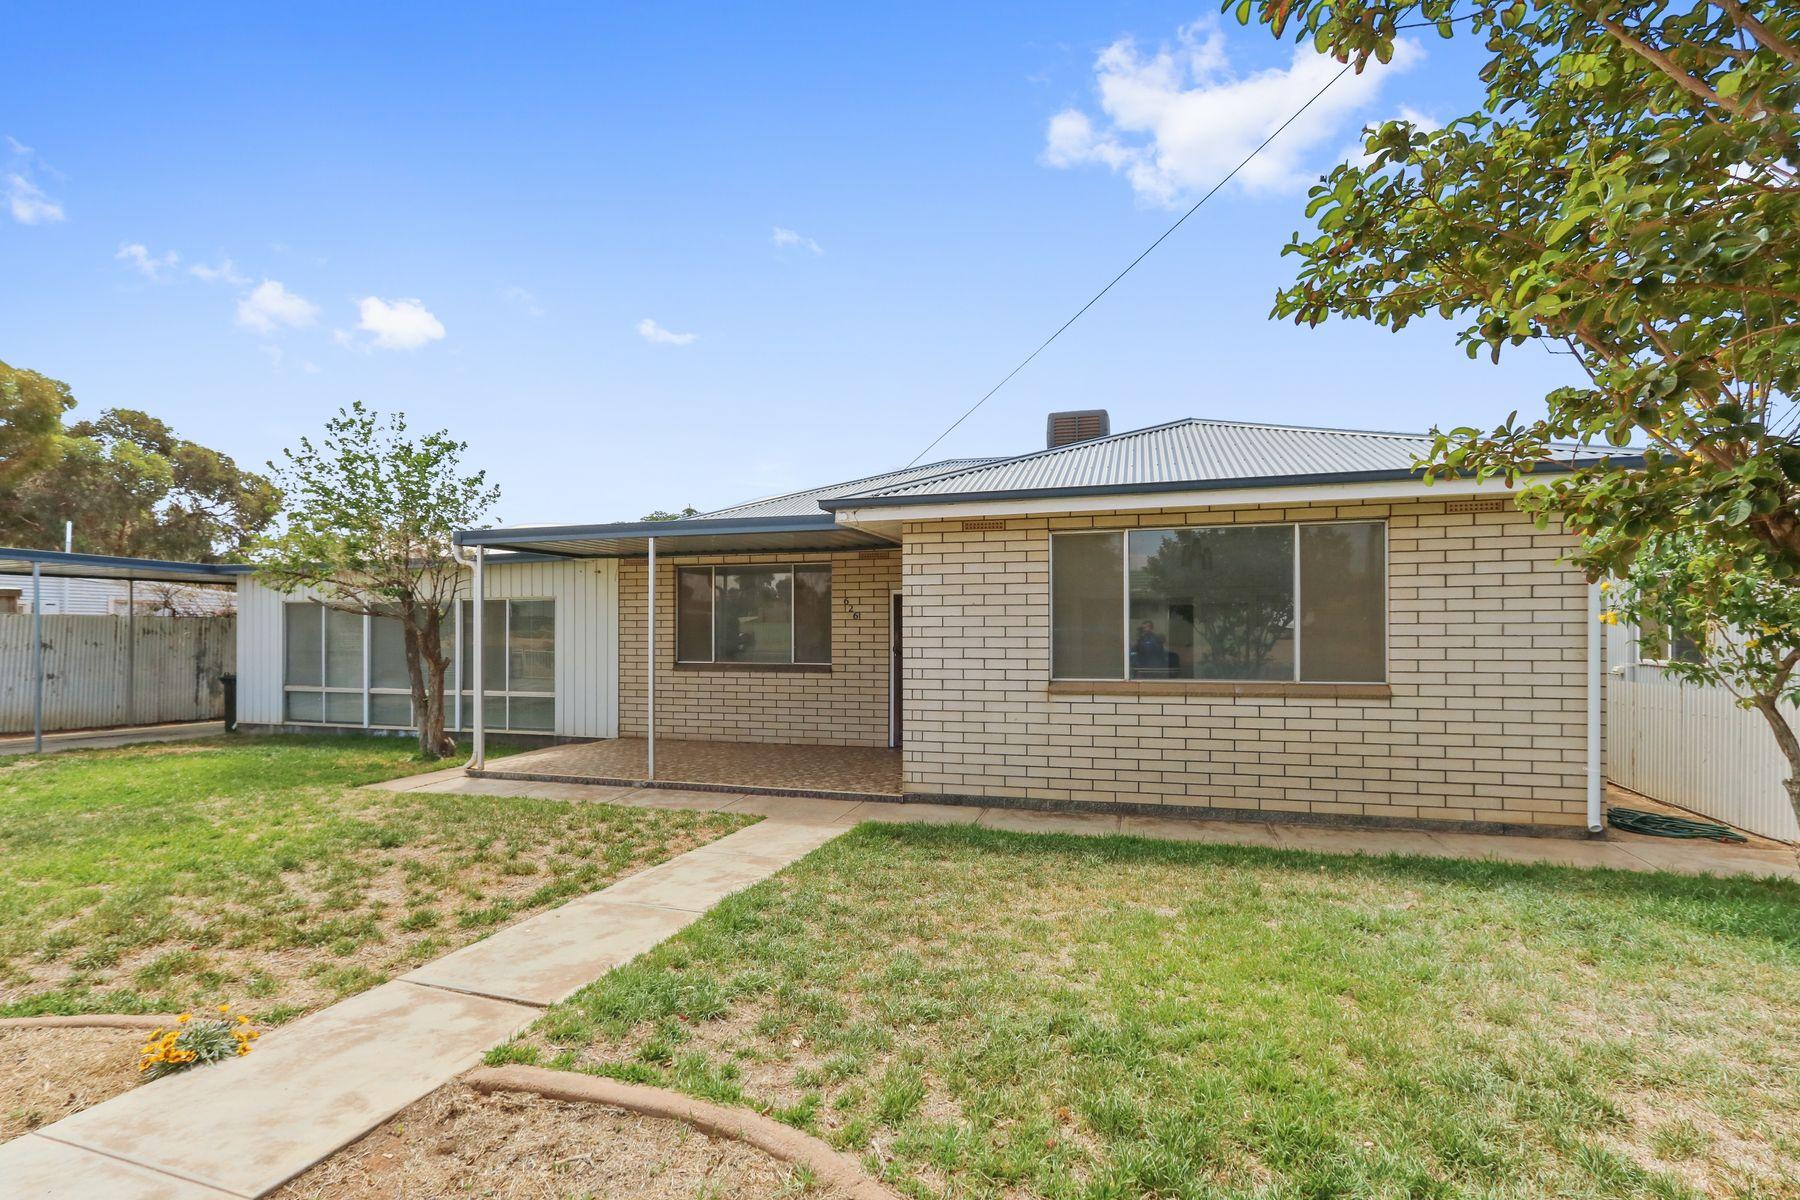 626 Beryl Street, Broken Hill, NSW 2880